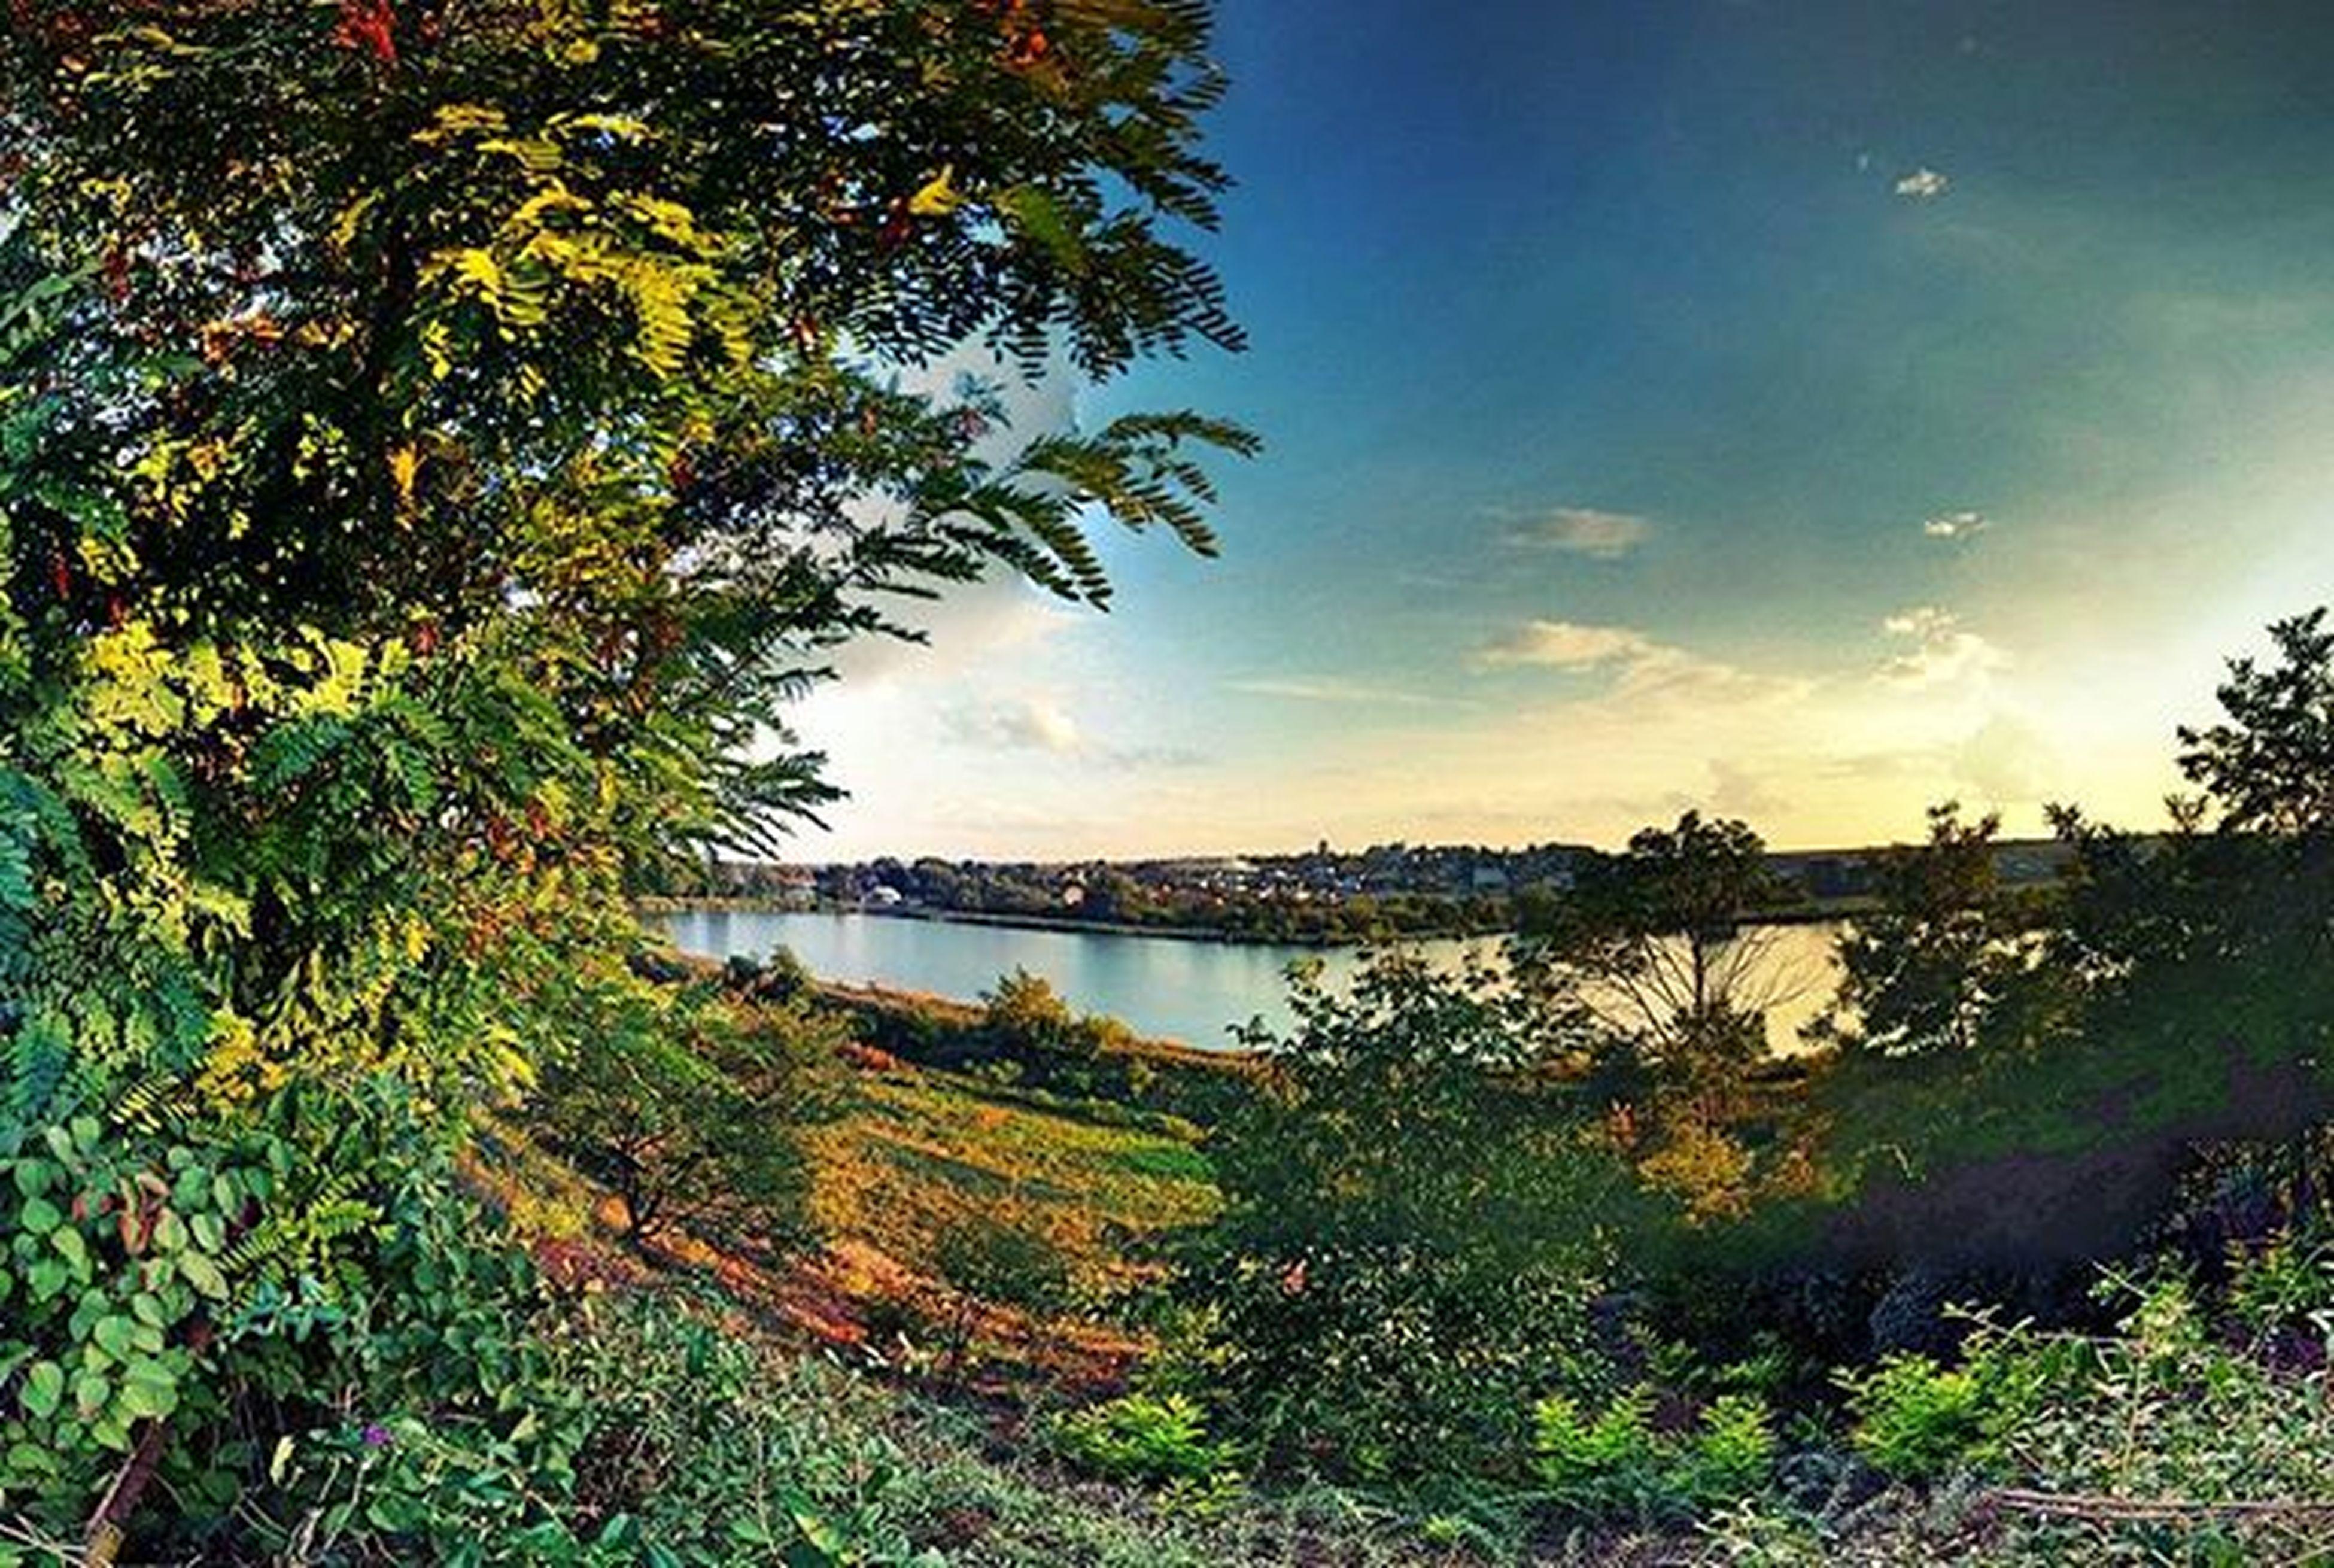 Підволочиське озеро)) озеро Lake підволочиськ Beautiful Bestoftheday TBT  Amazing Nature Природа прогулка Fotorapp